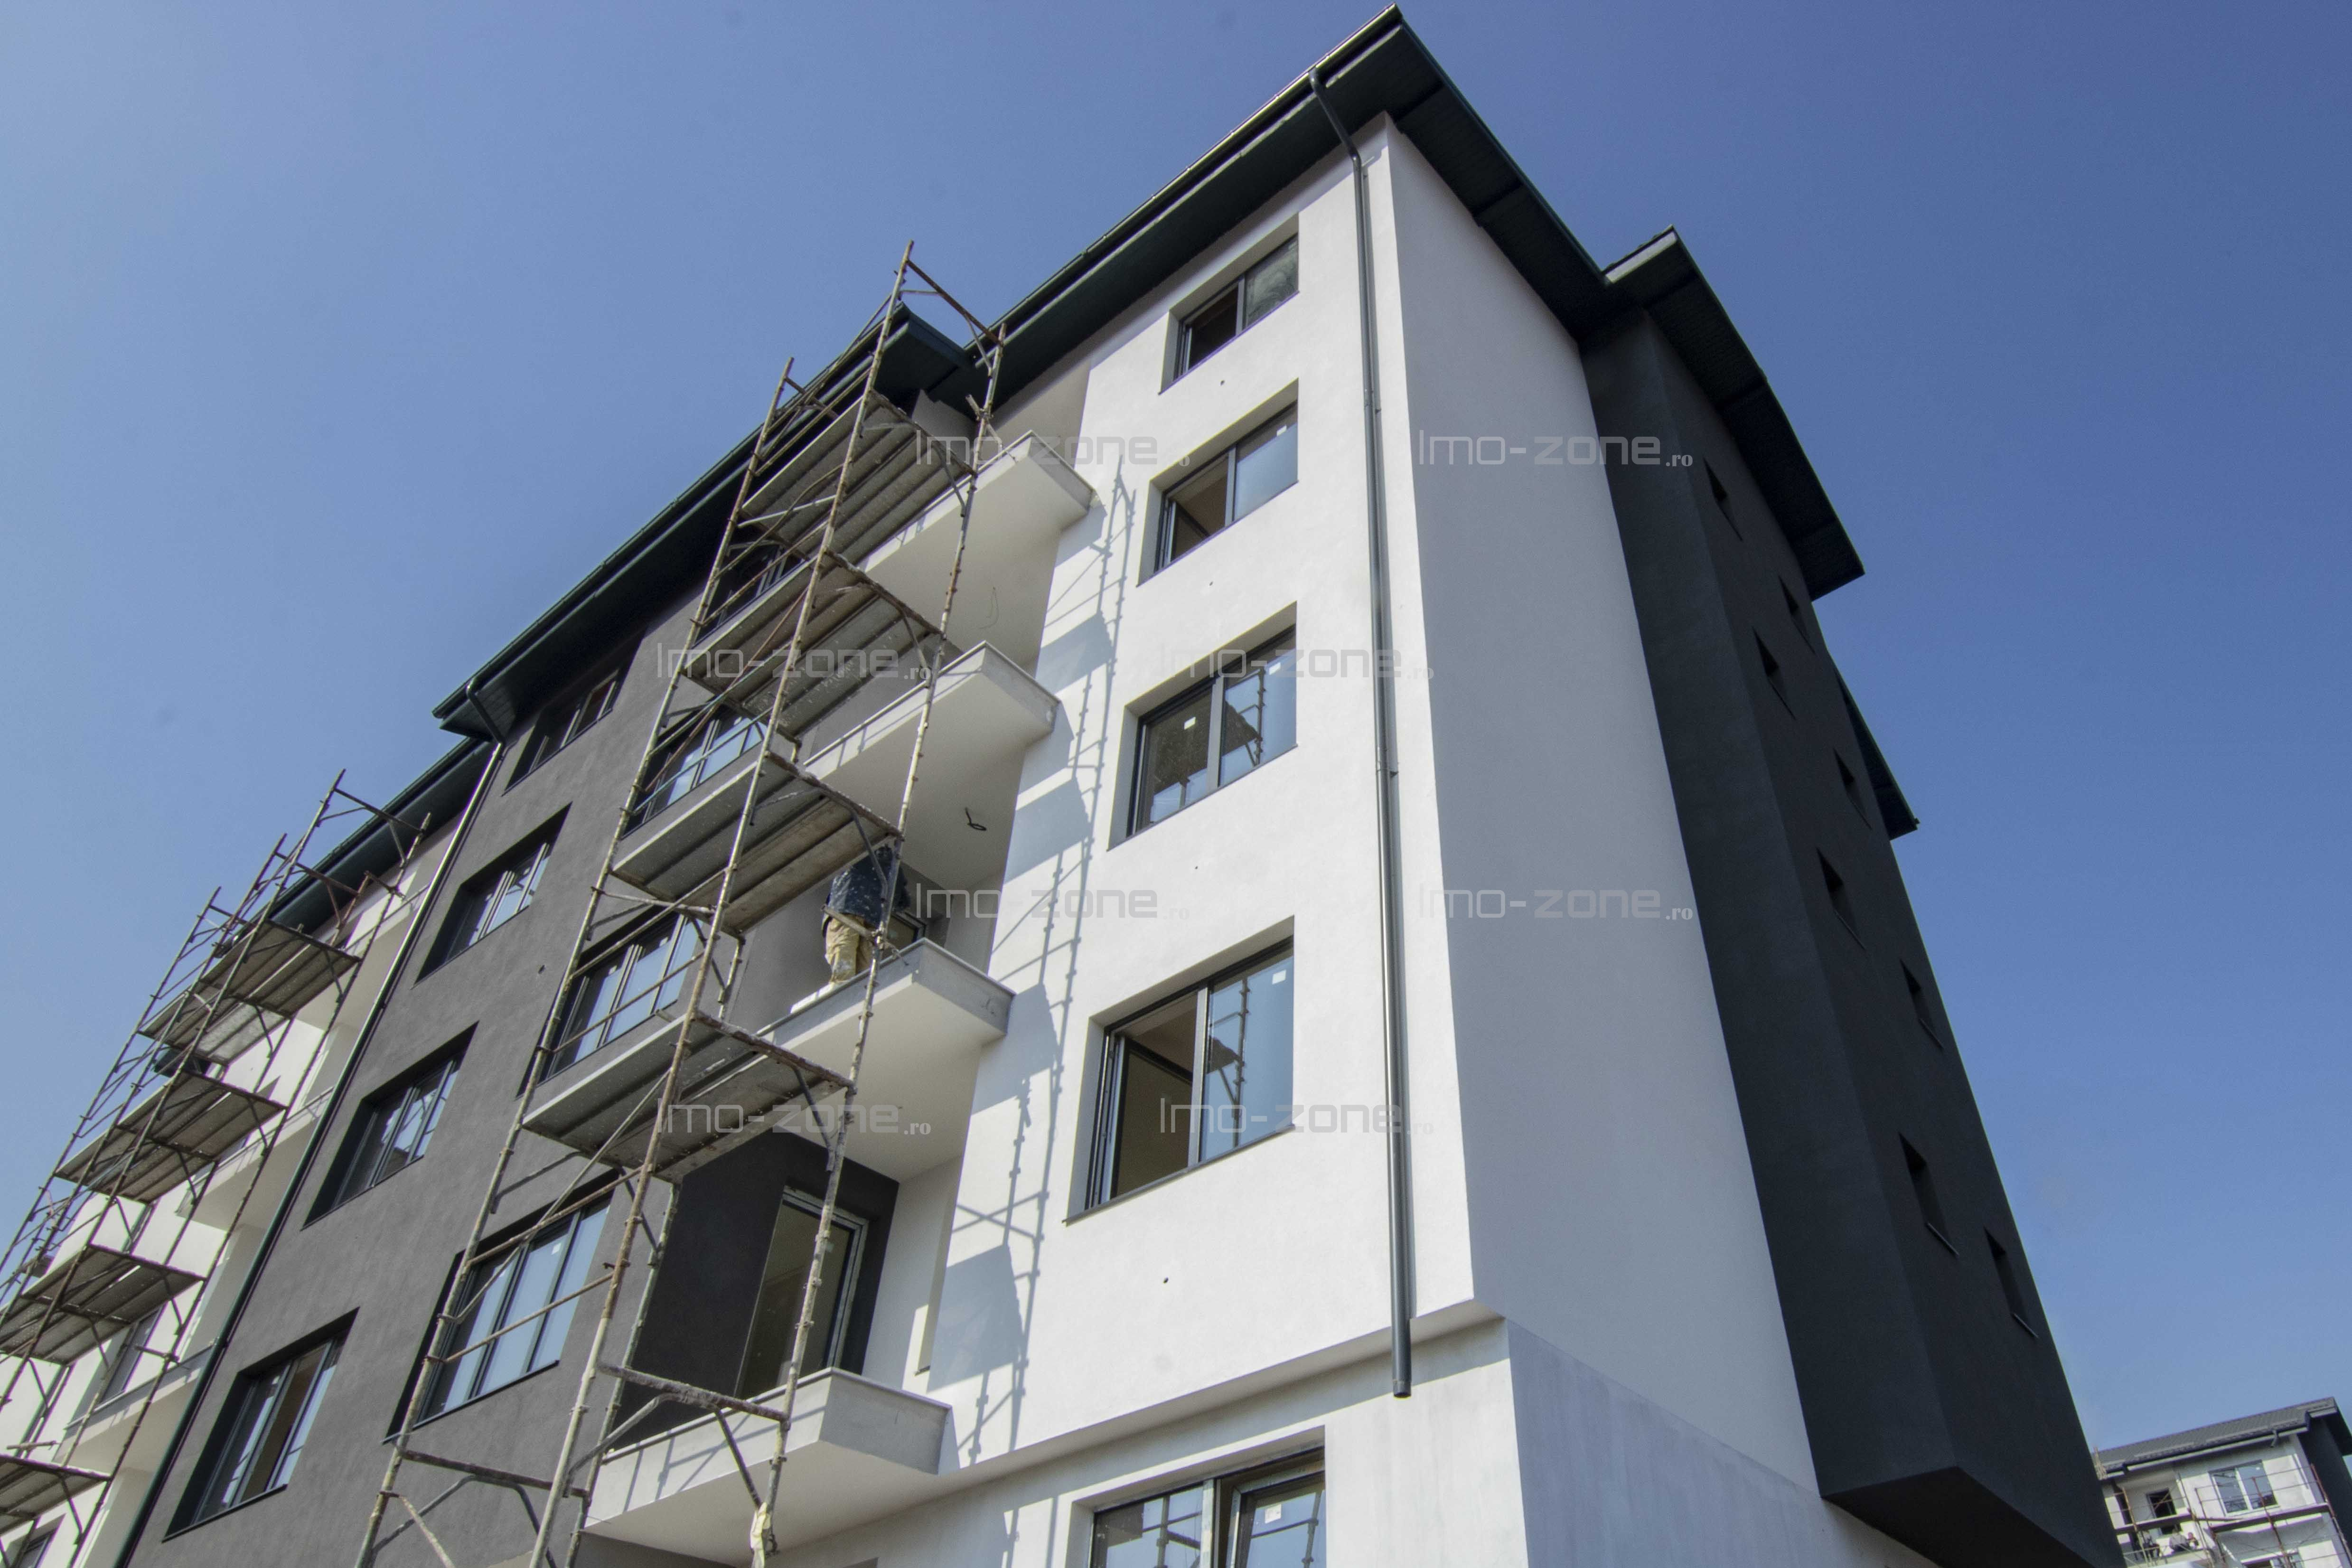 Apartament predat la CHEIE, modern, langa PARC BRANCUSI, comision 0%